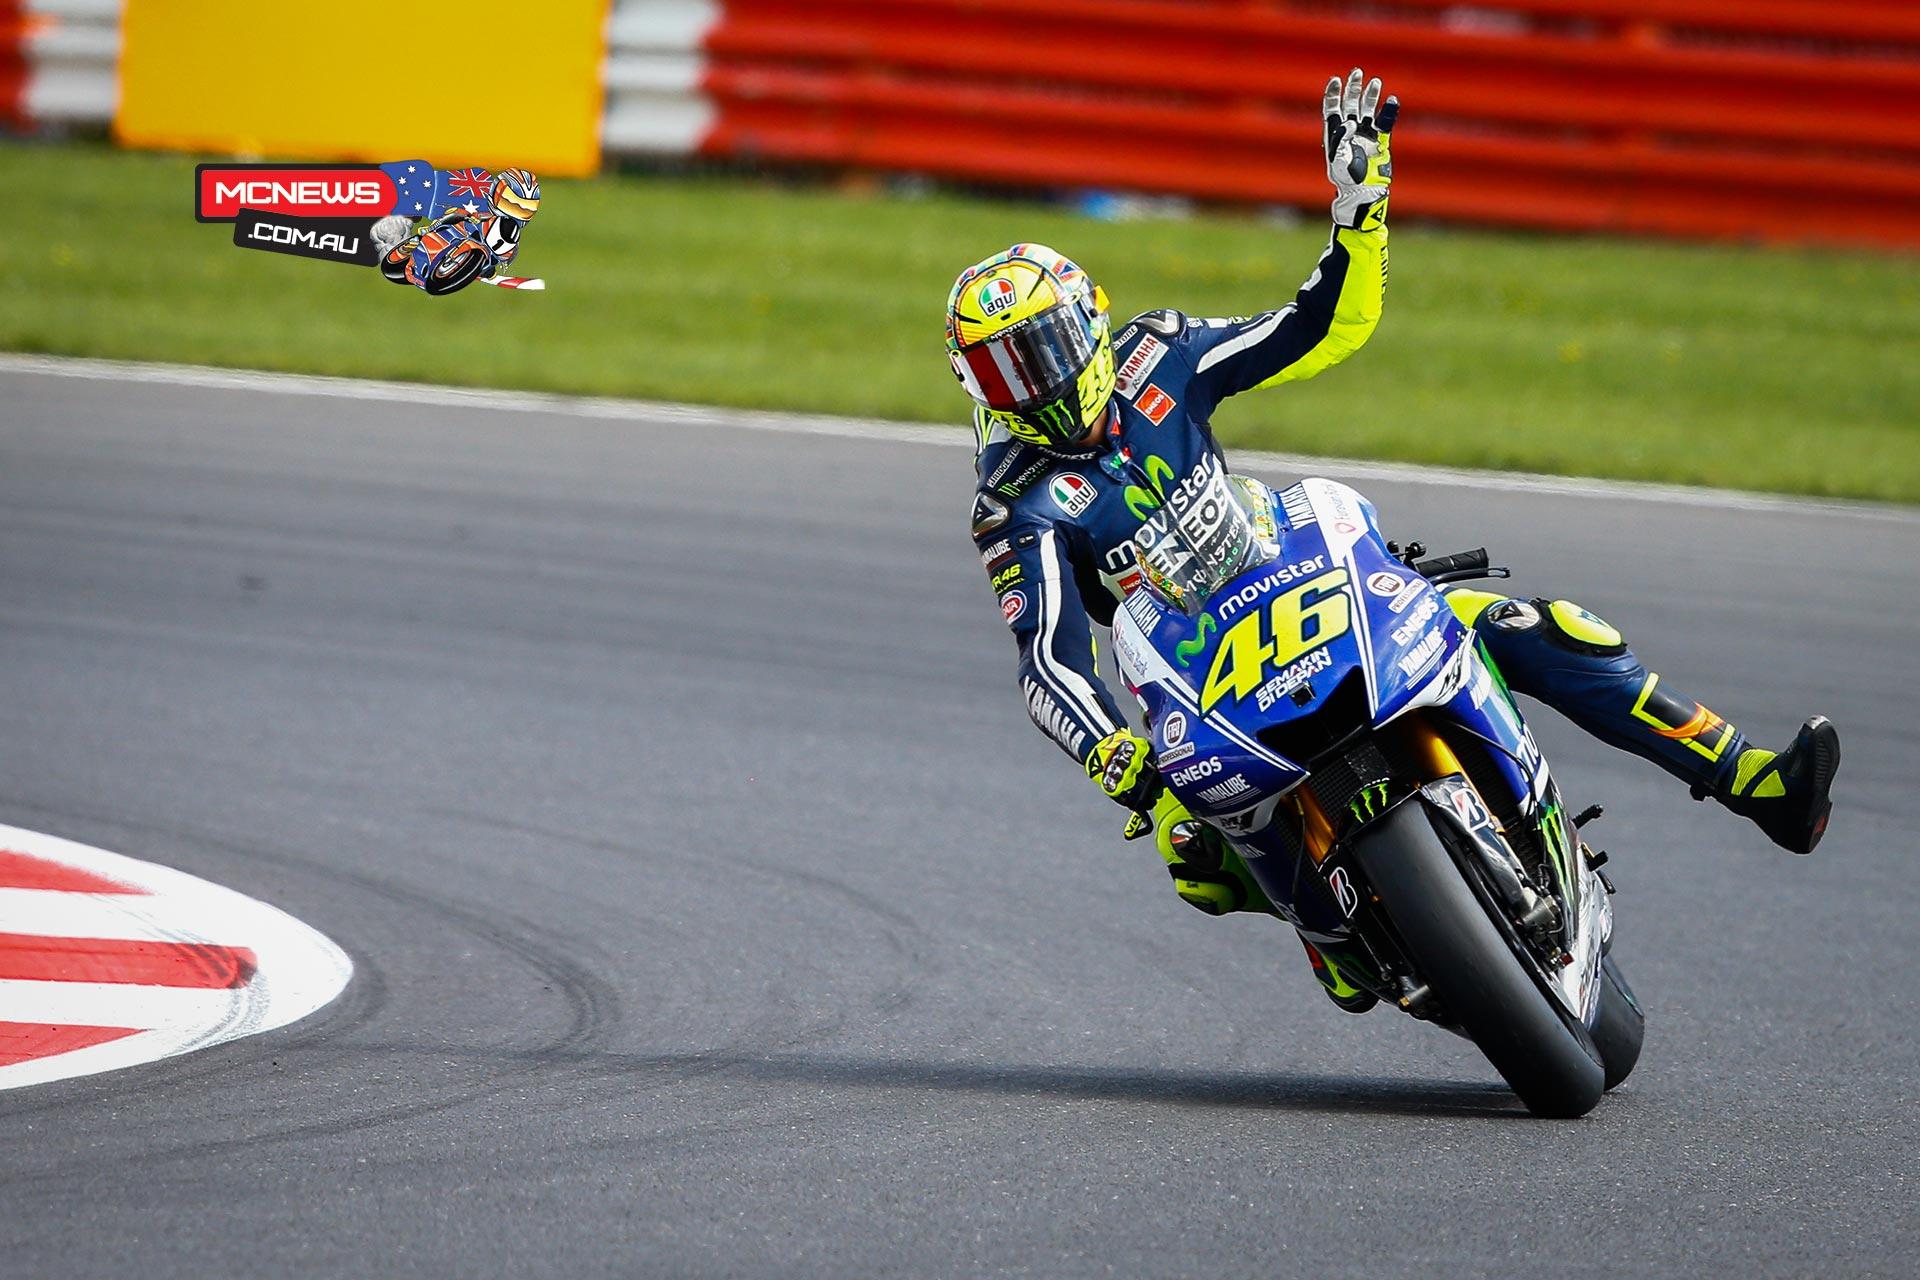 Marquez fends off Lorenzo at Silverstone – Valentino Rossi Birthday Card